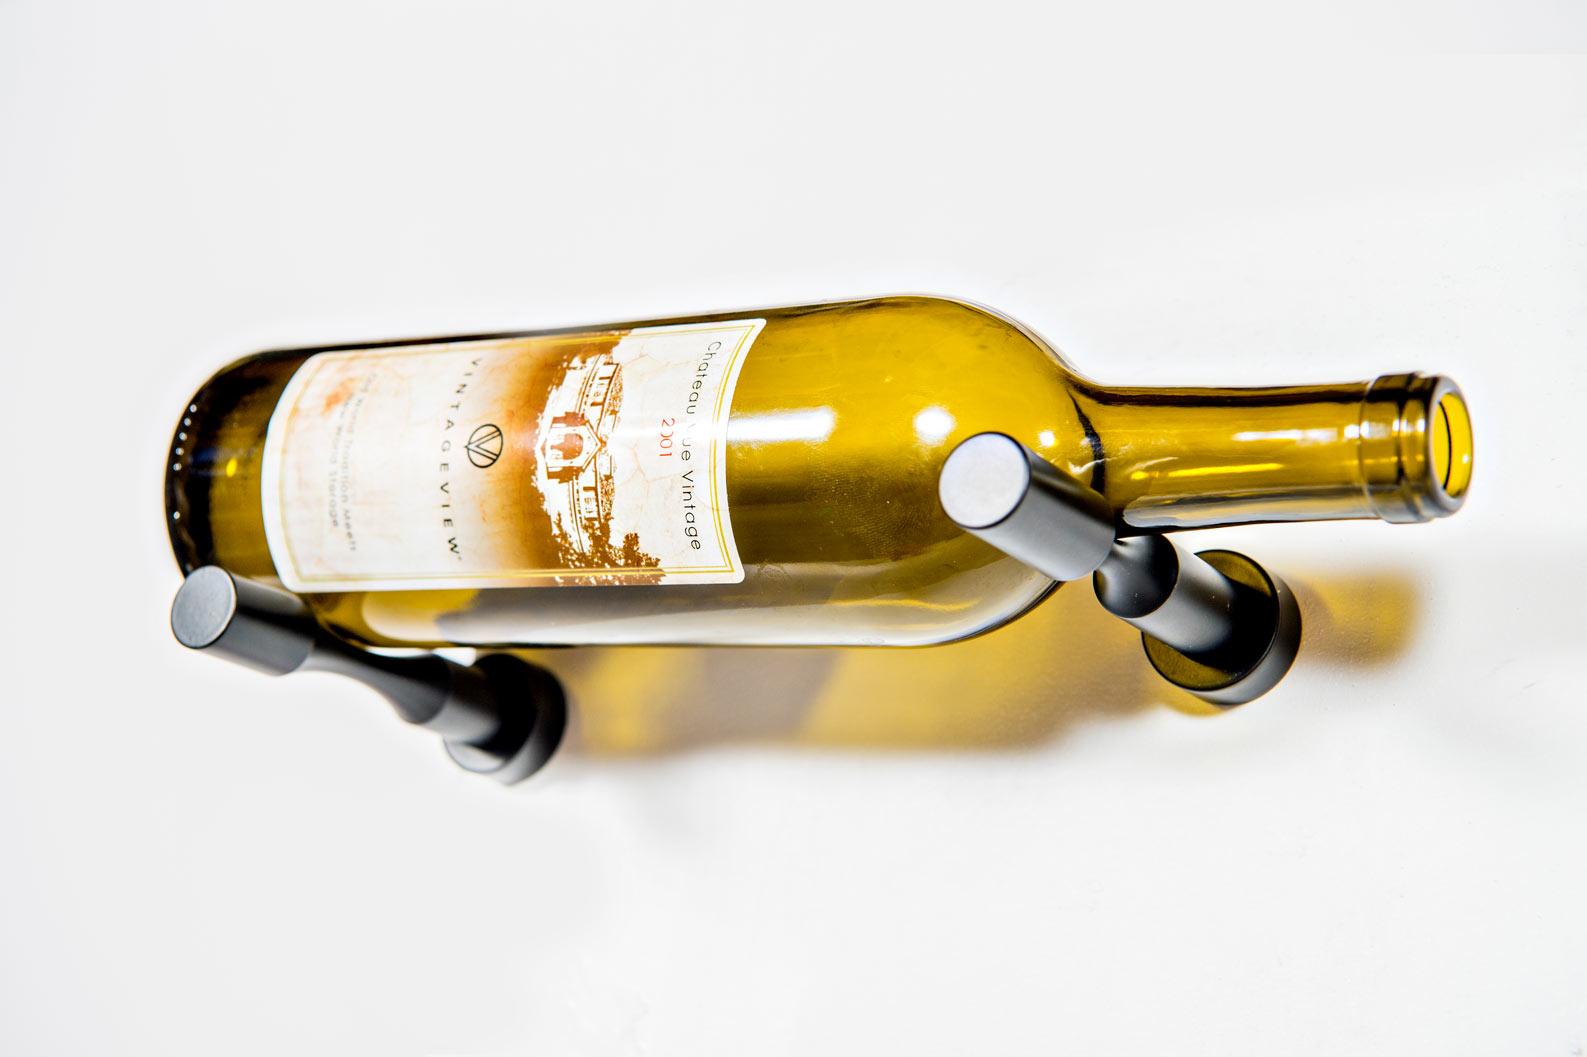 vino pins 1 bottle wall mounted metal wine rack peg